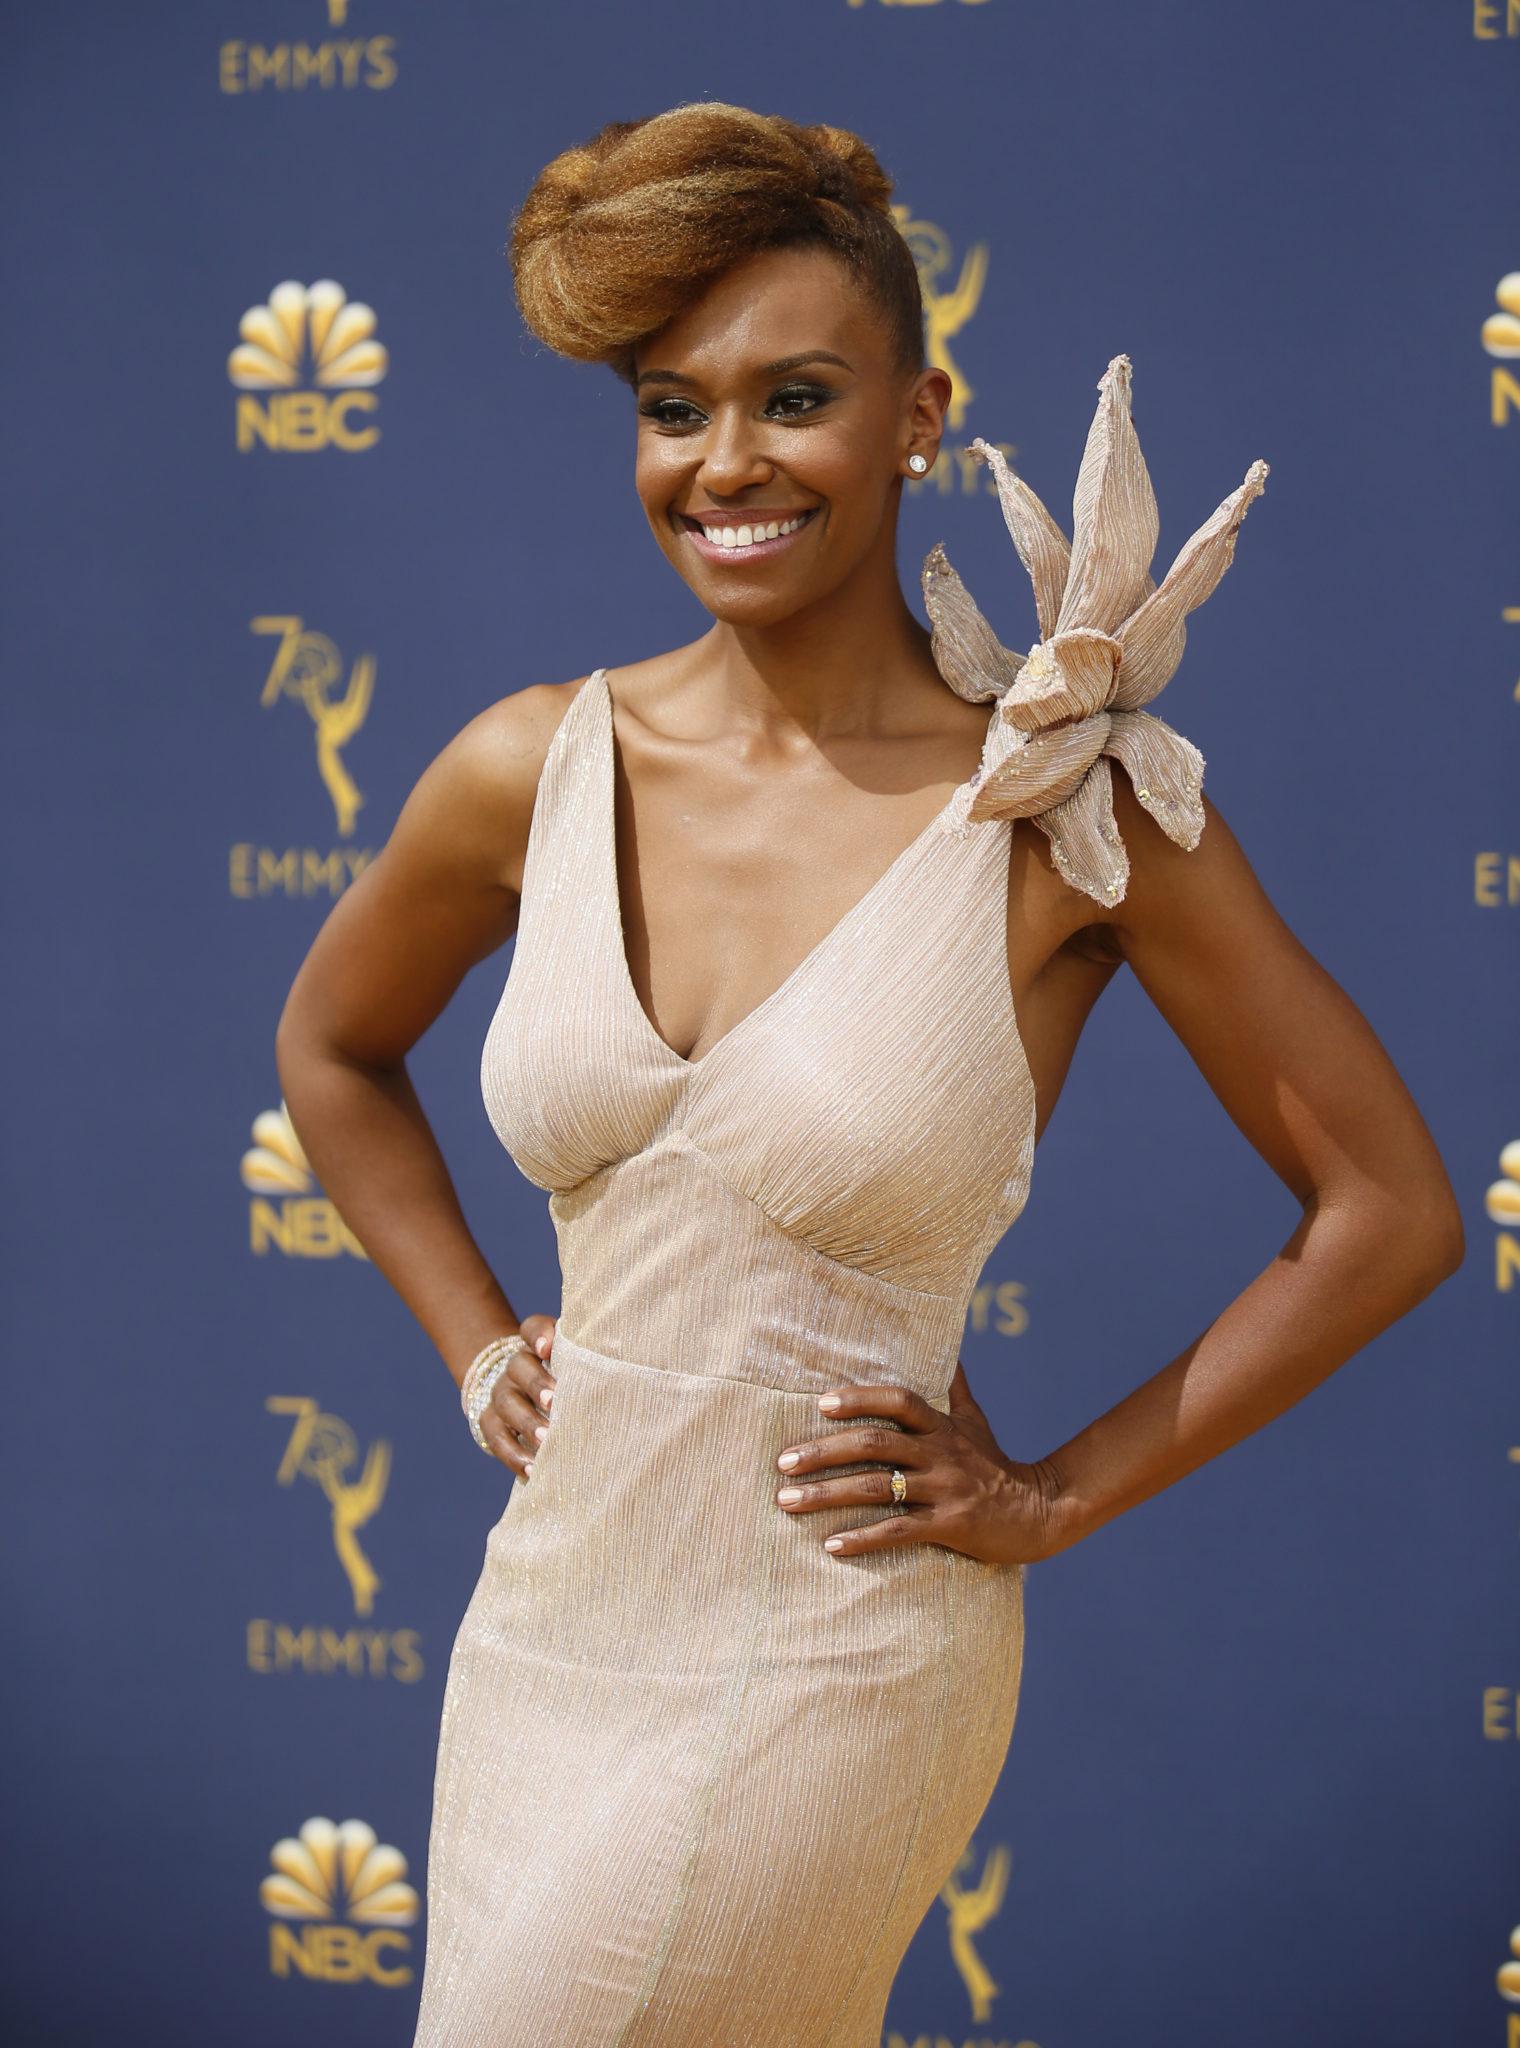 Ryan Michelle Bathe Emmys 4Chion Lifestyle